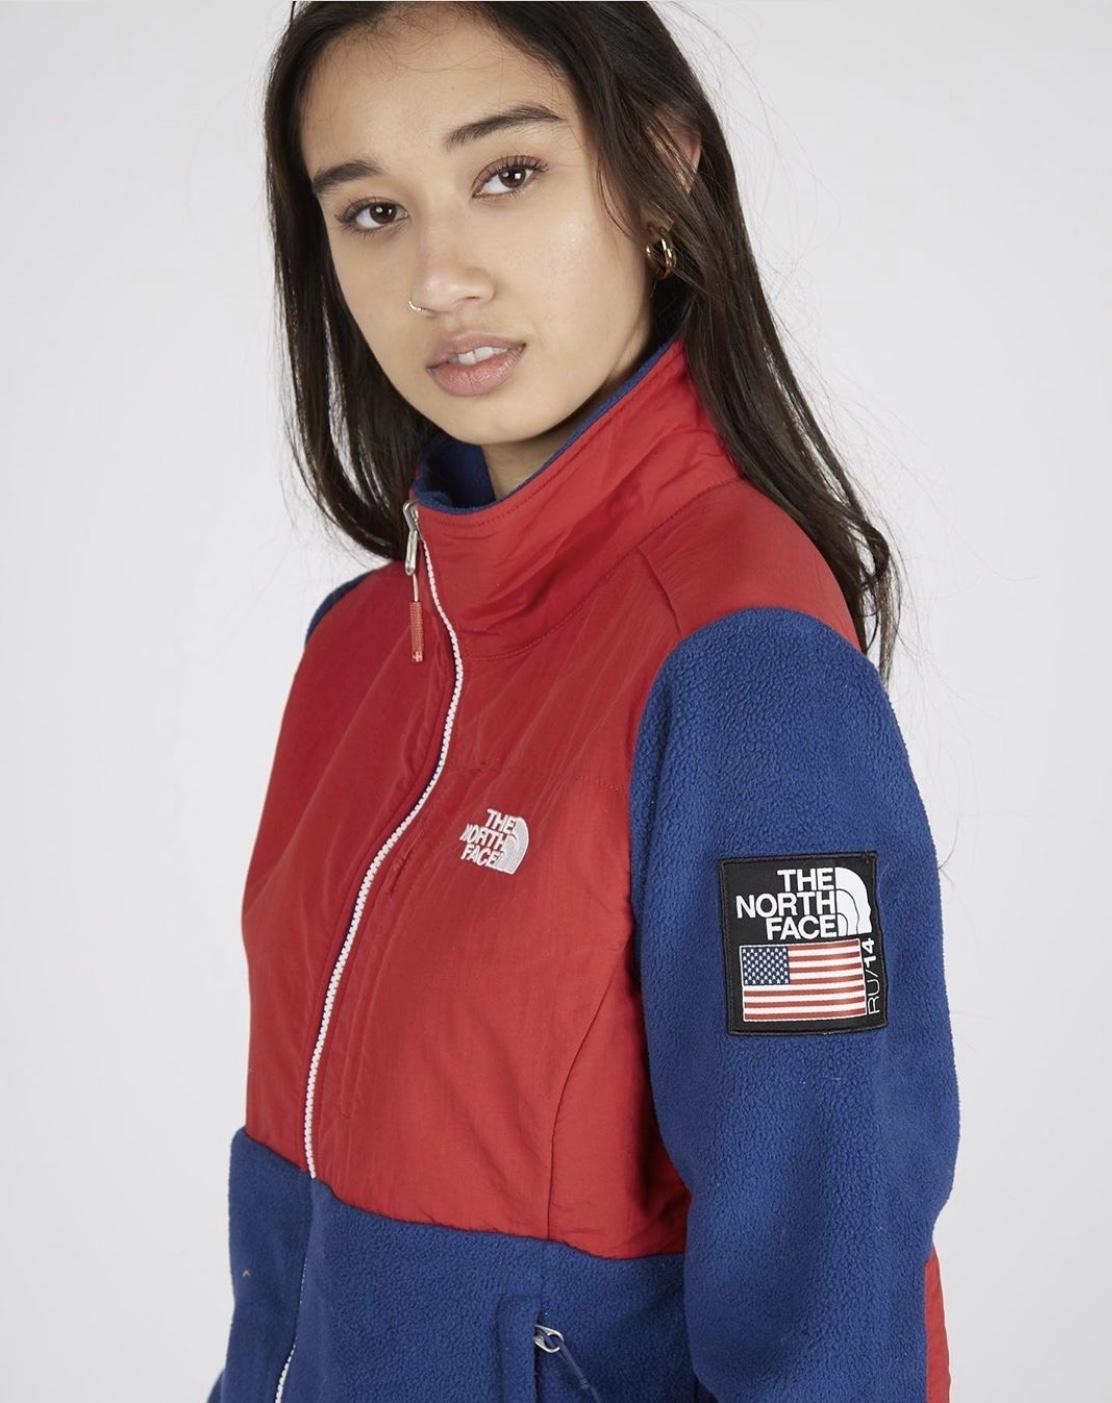 Shine-Female-Model-Annie-Asian-London-05.jpg#asset:52839